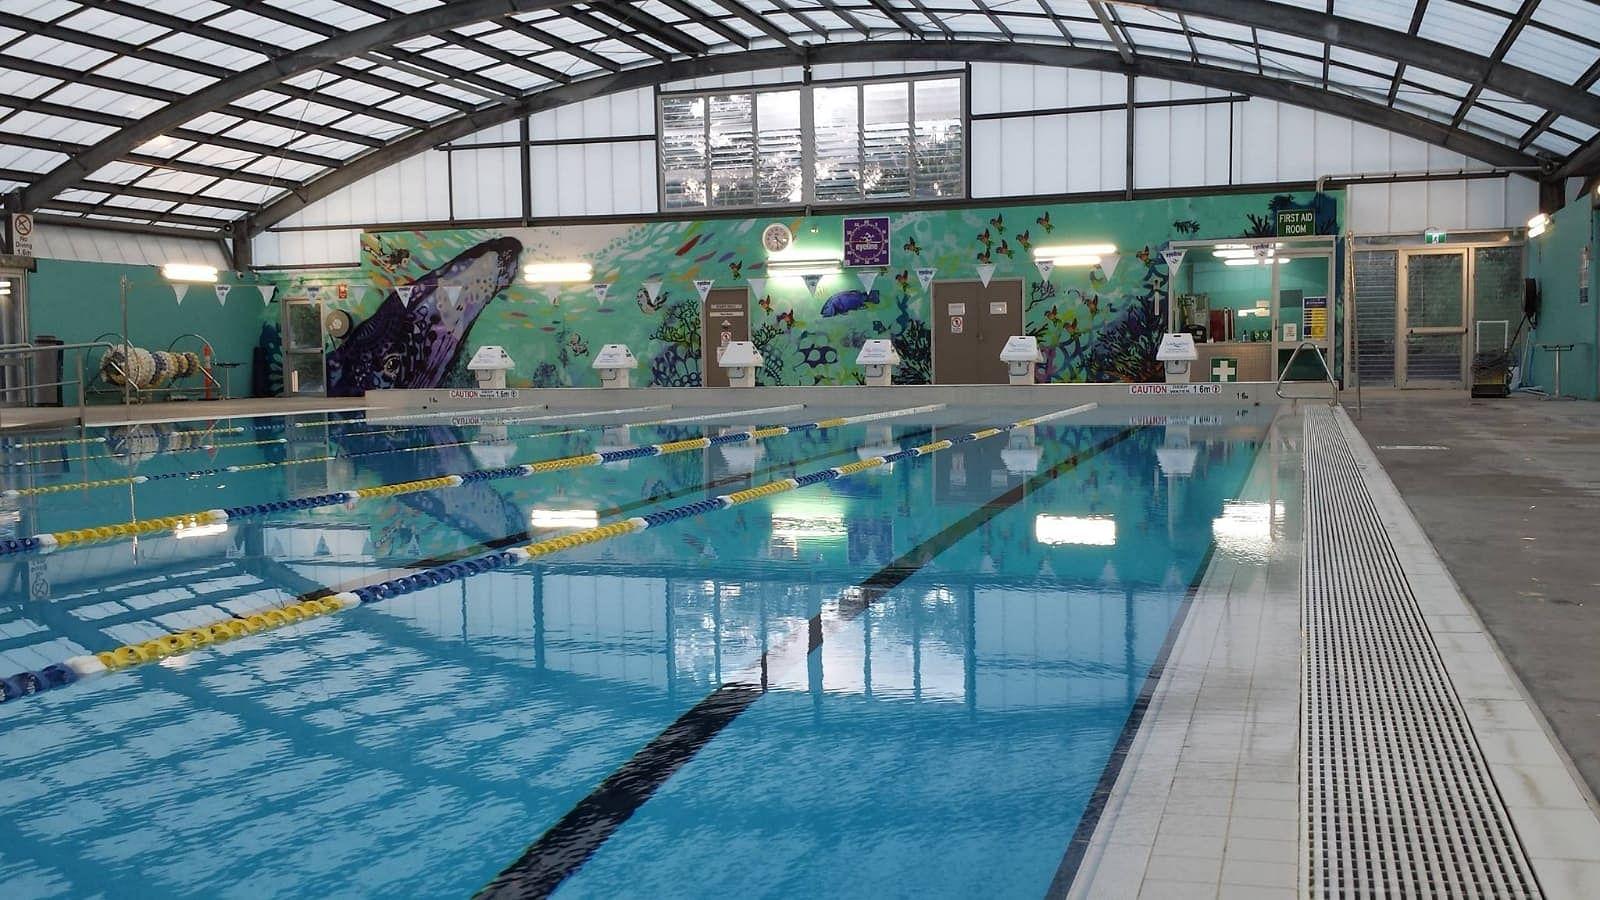 Sapphire Aquatic Centre pool.